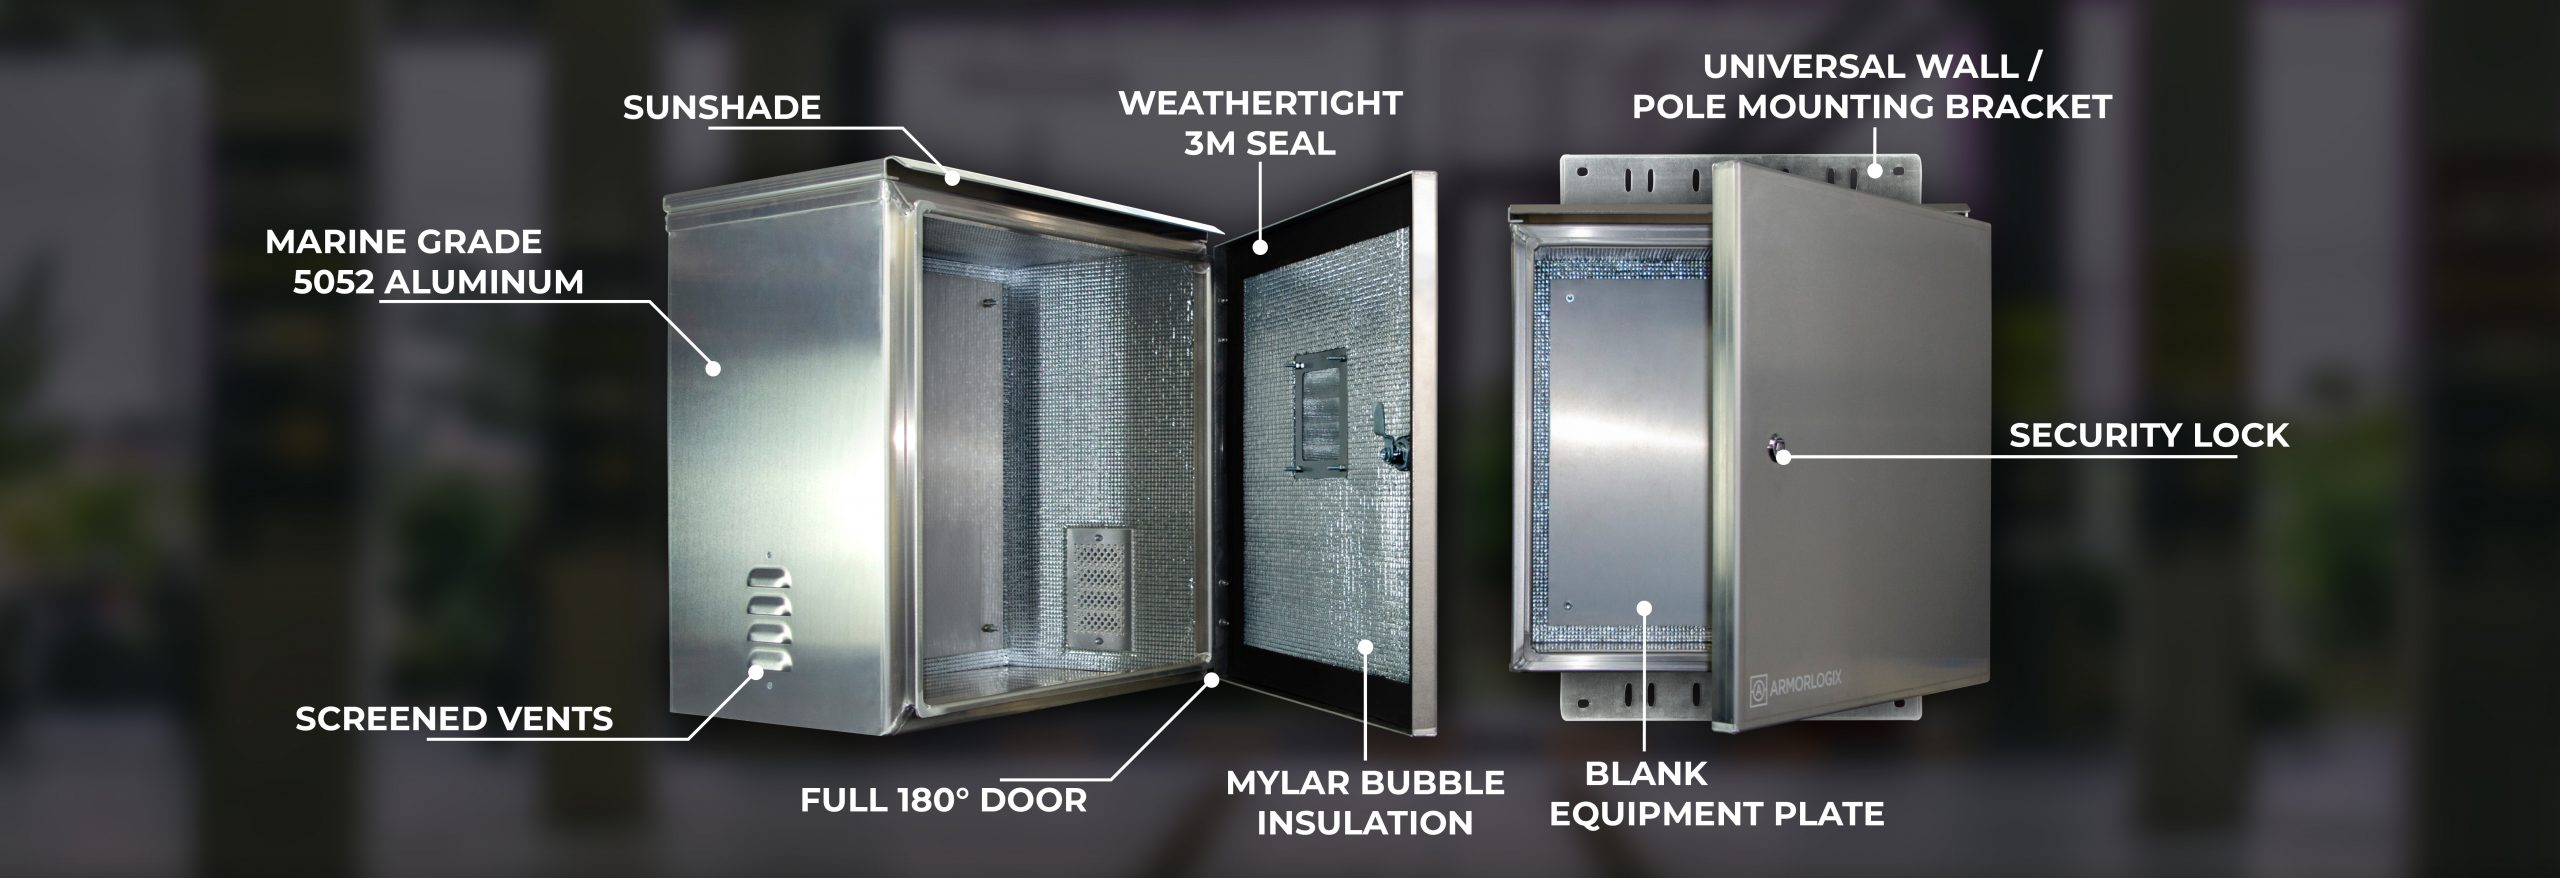 NEMA 3 and NEMA 4 weatheproof enclosures - Features